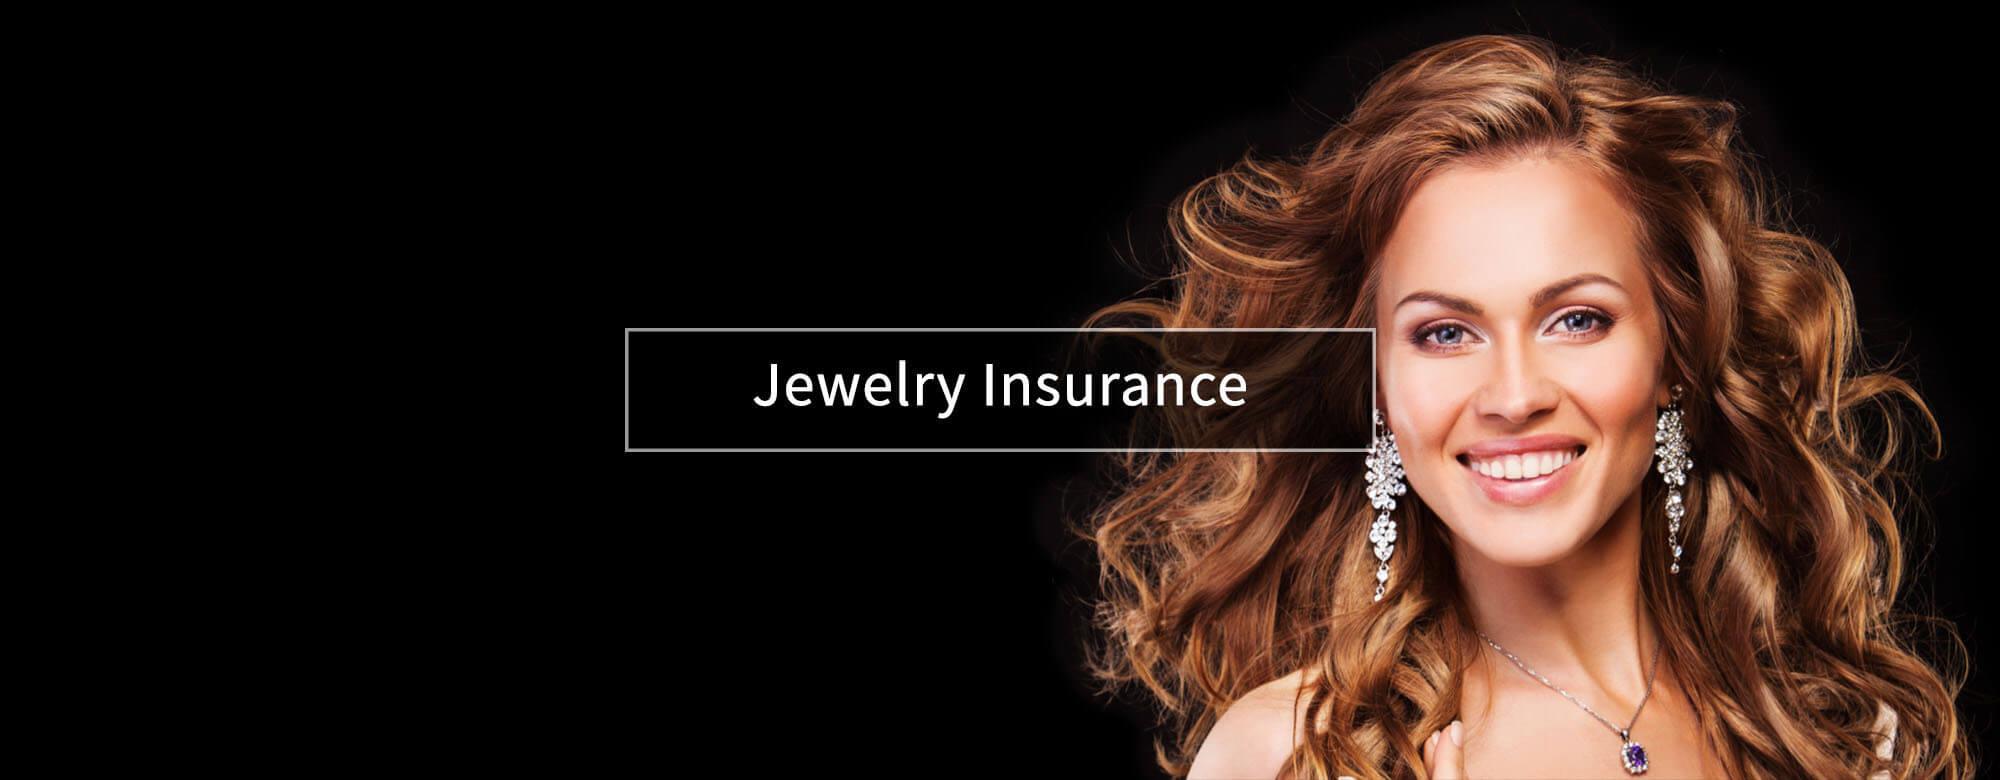 Jewelry_insurance_Header (1).jpg